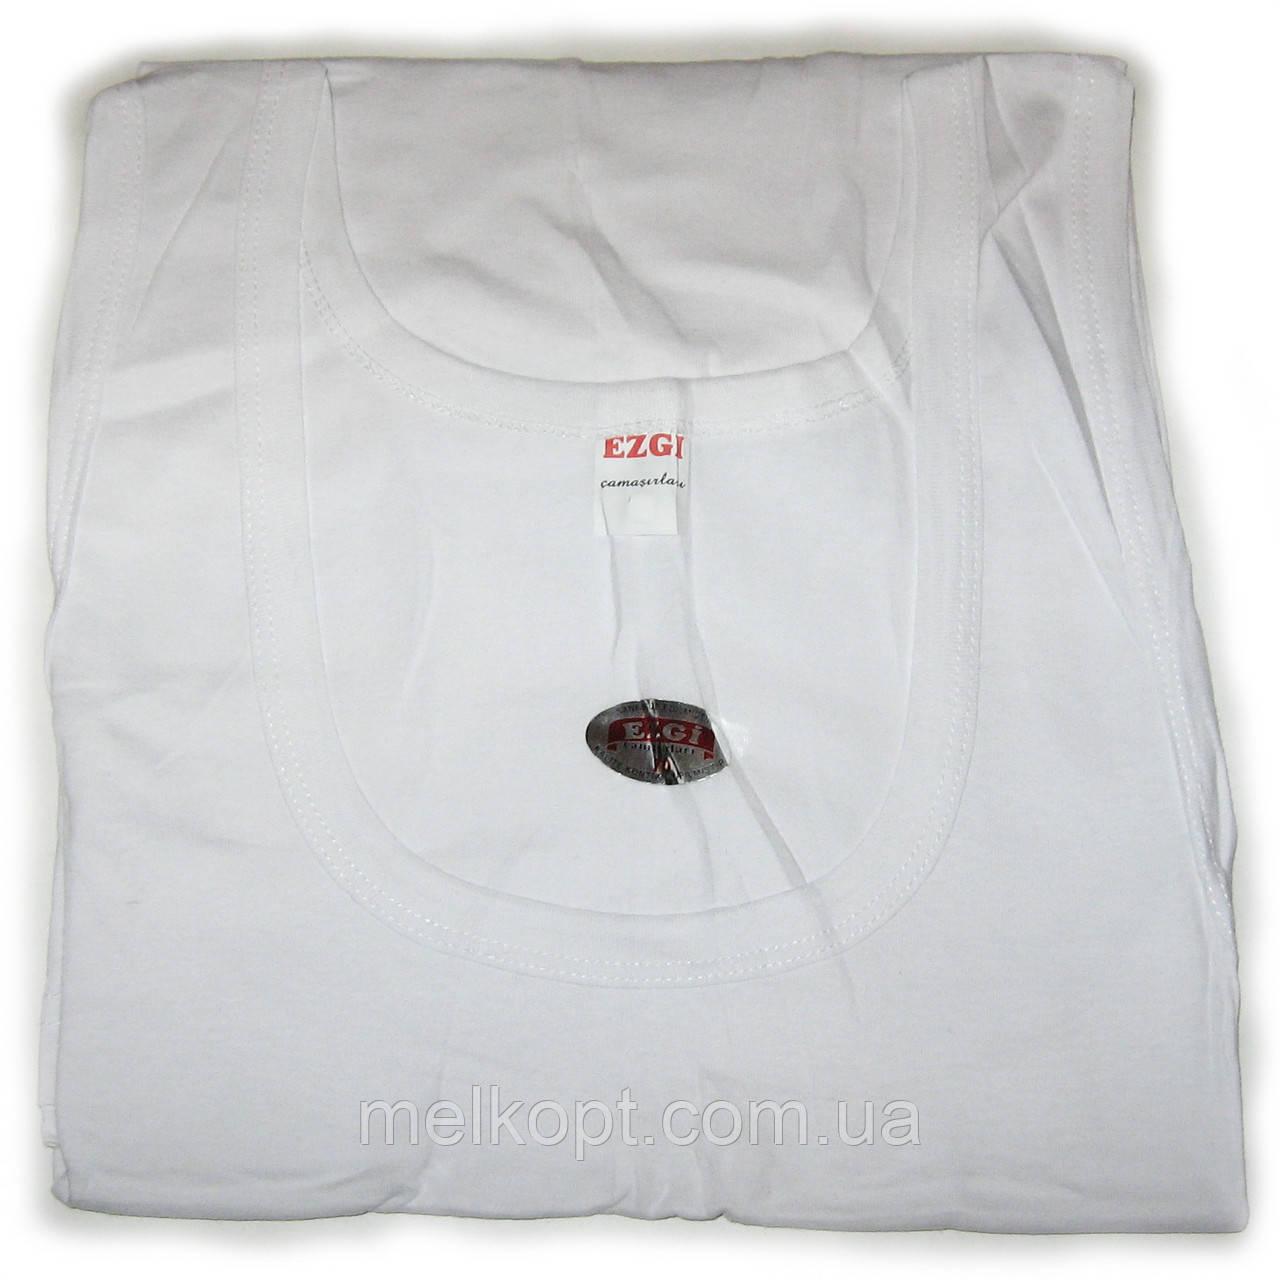 Мужские майки Ezgi - 53,00 грн./шт. (80-й размер, белые)